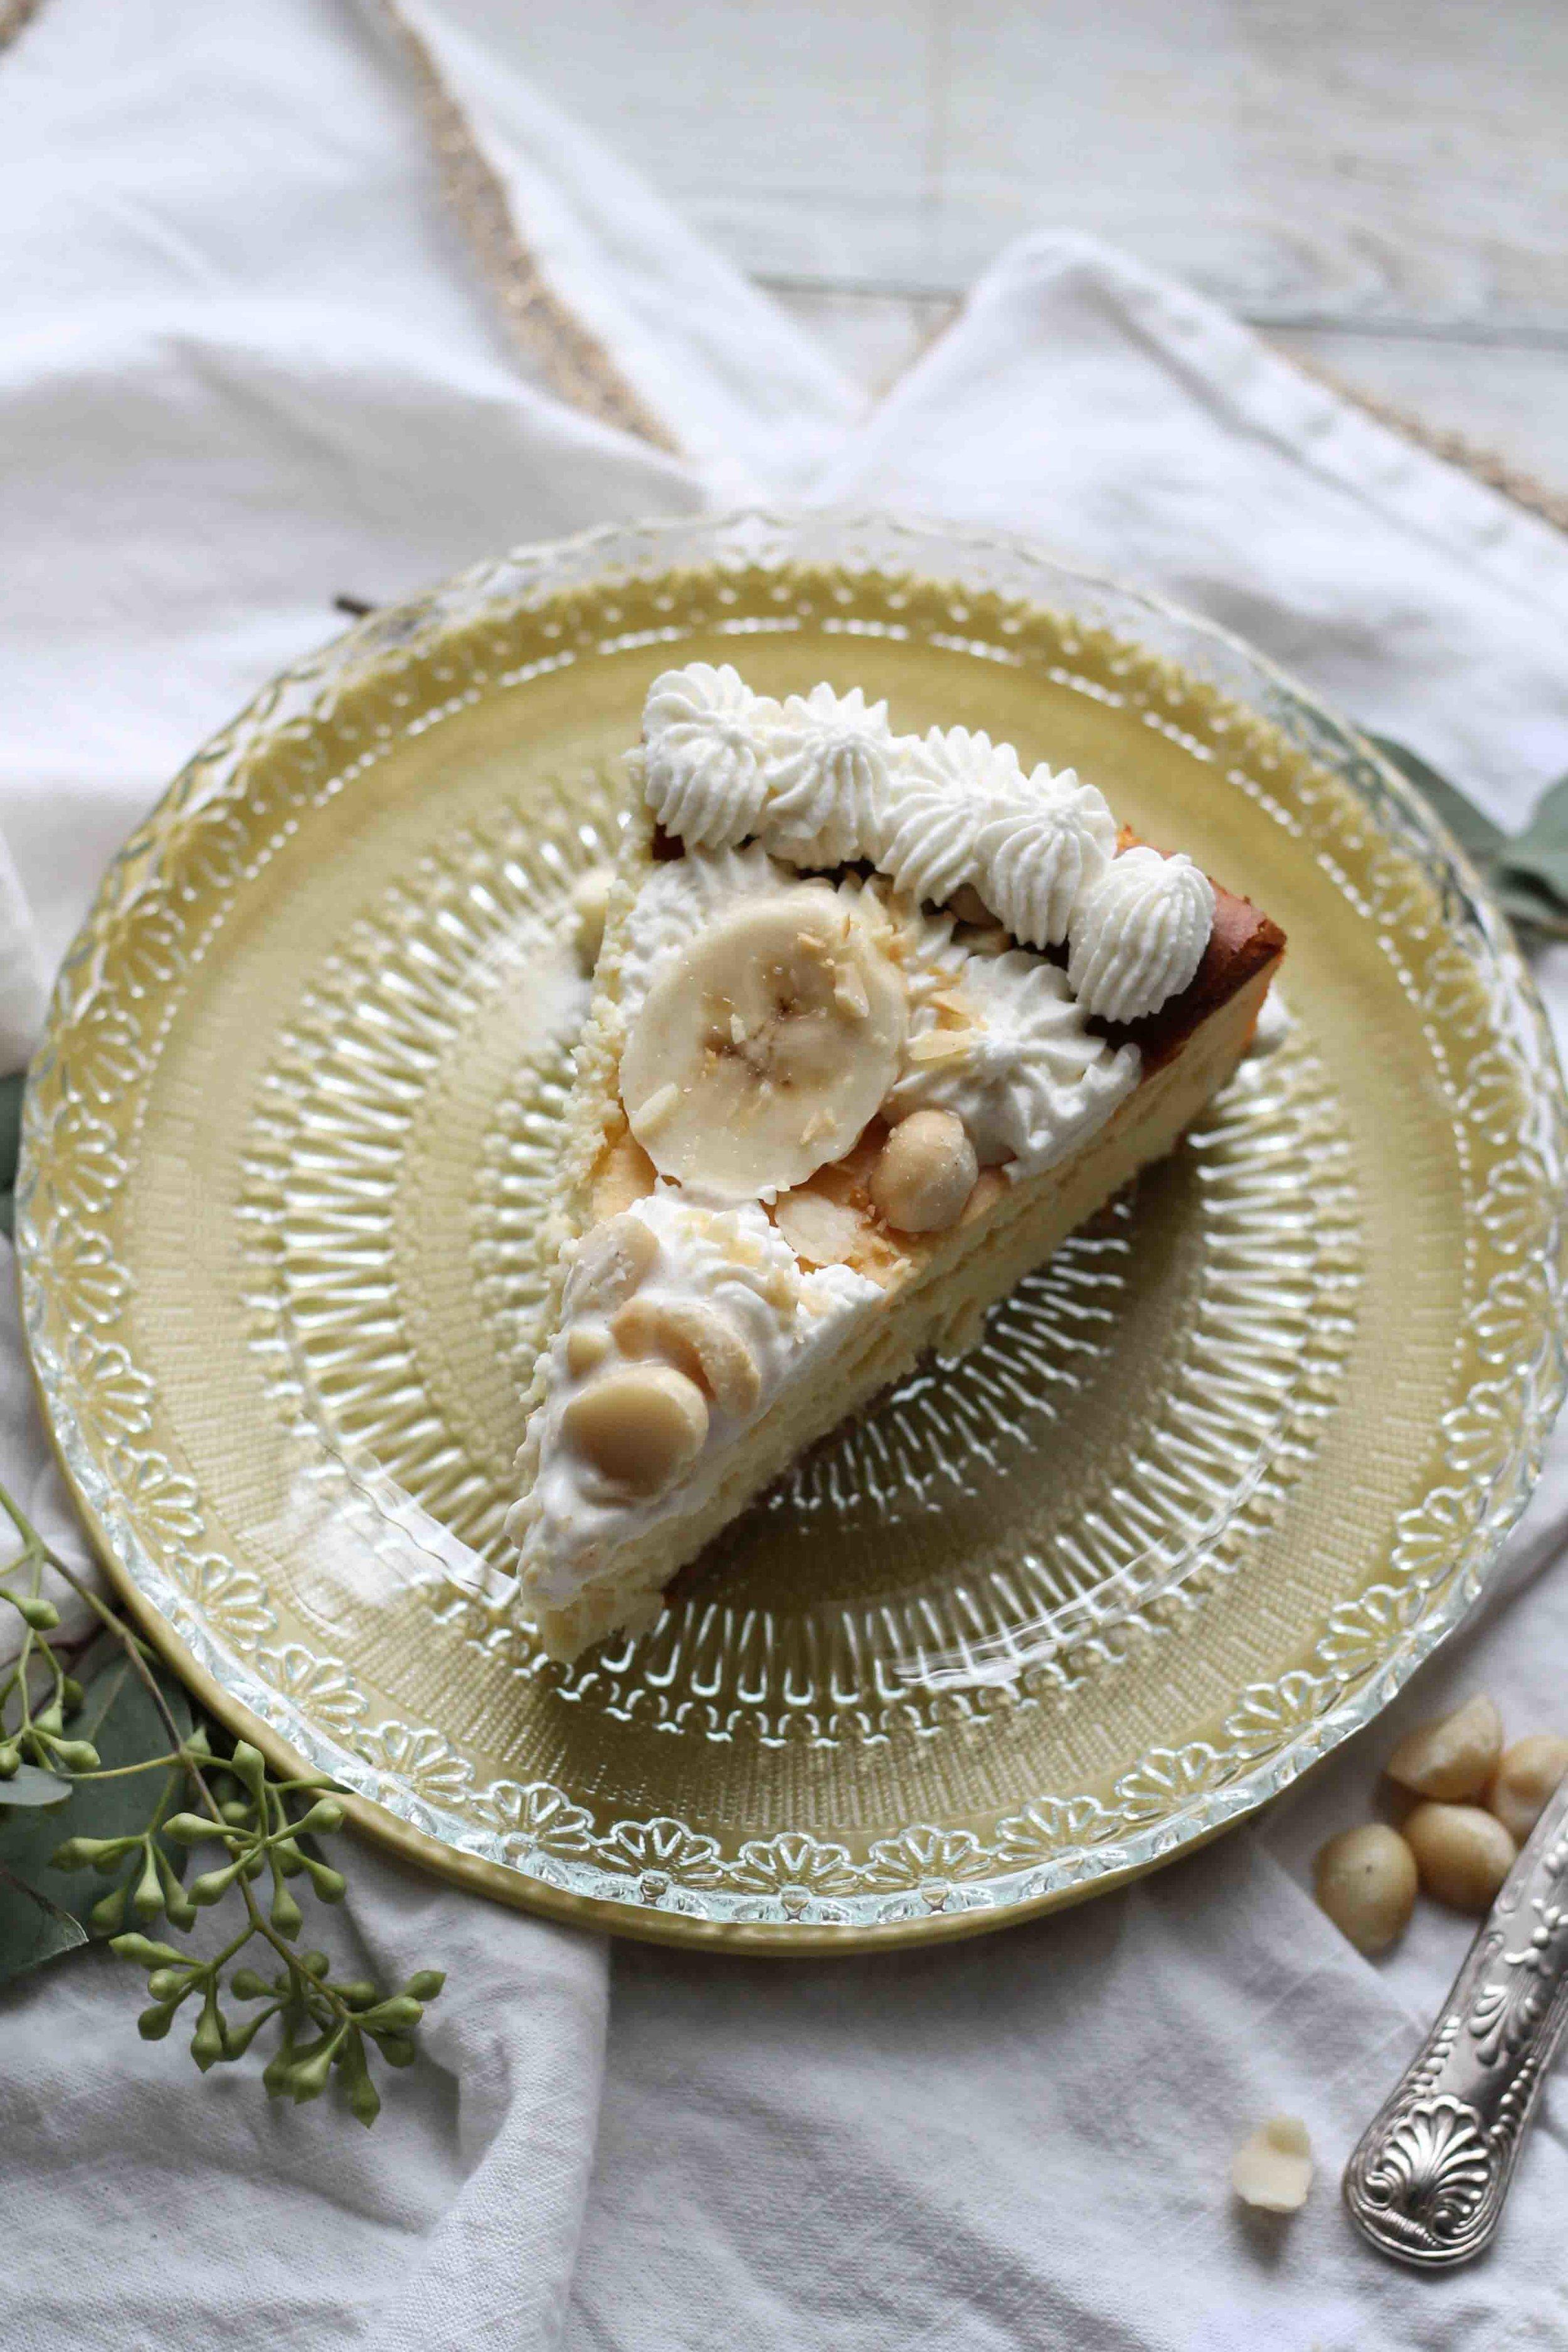 White Chocolate Cheesecake with Banana & Macadamia Nuts {Pedantic Foodie}